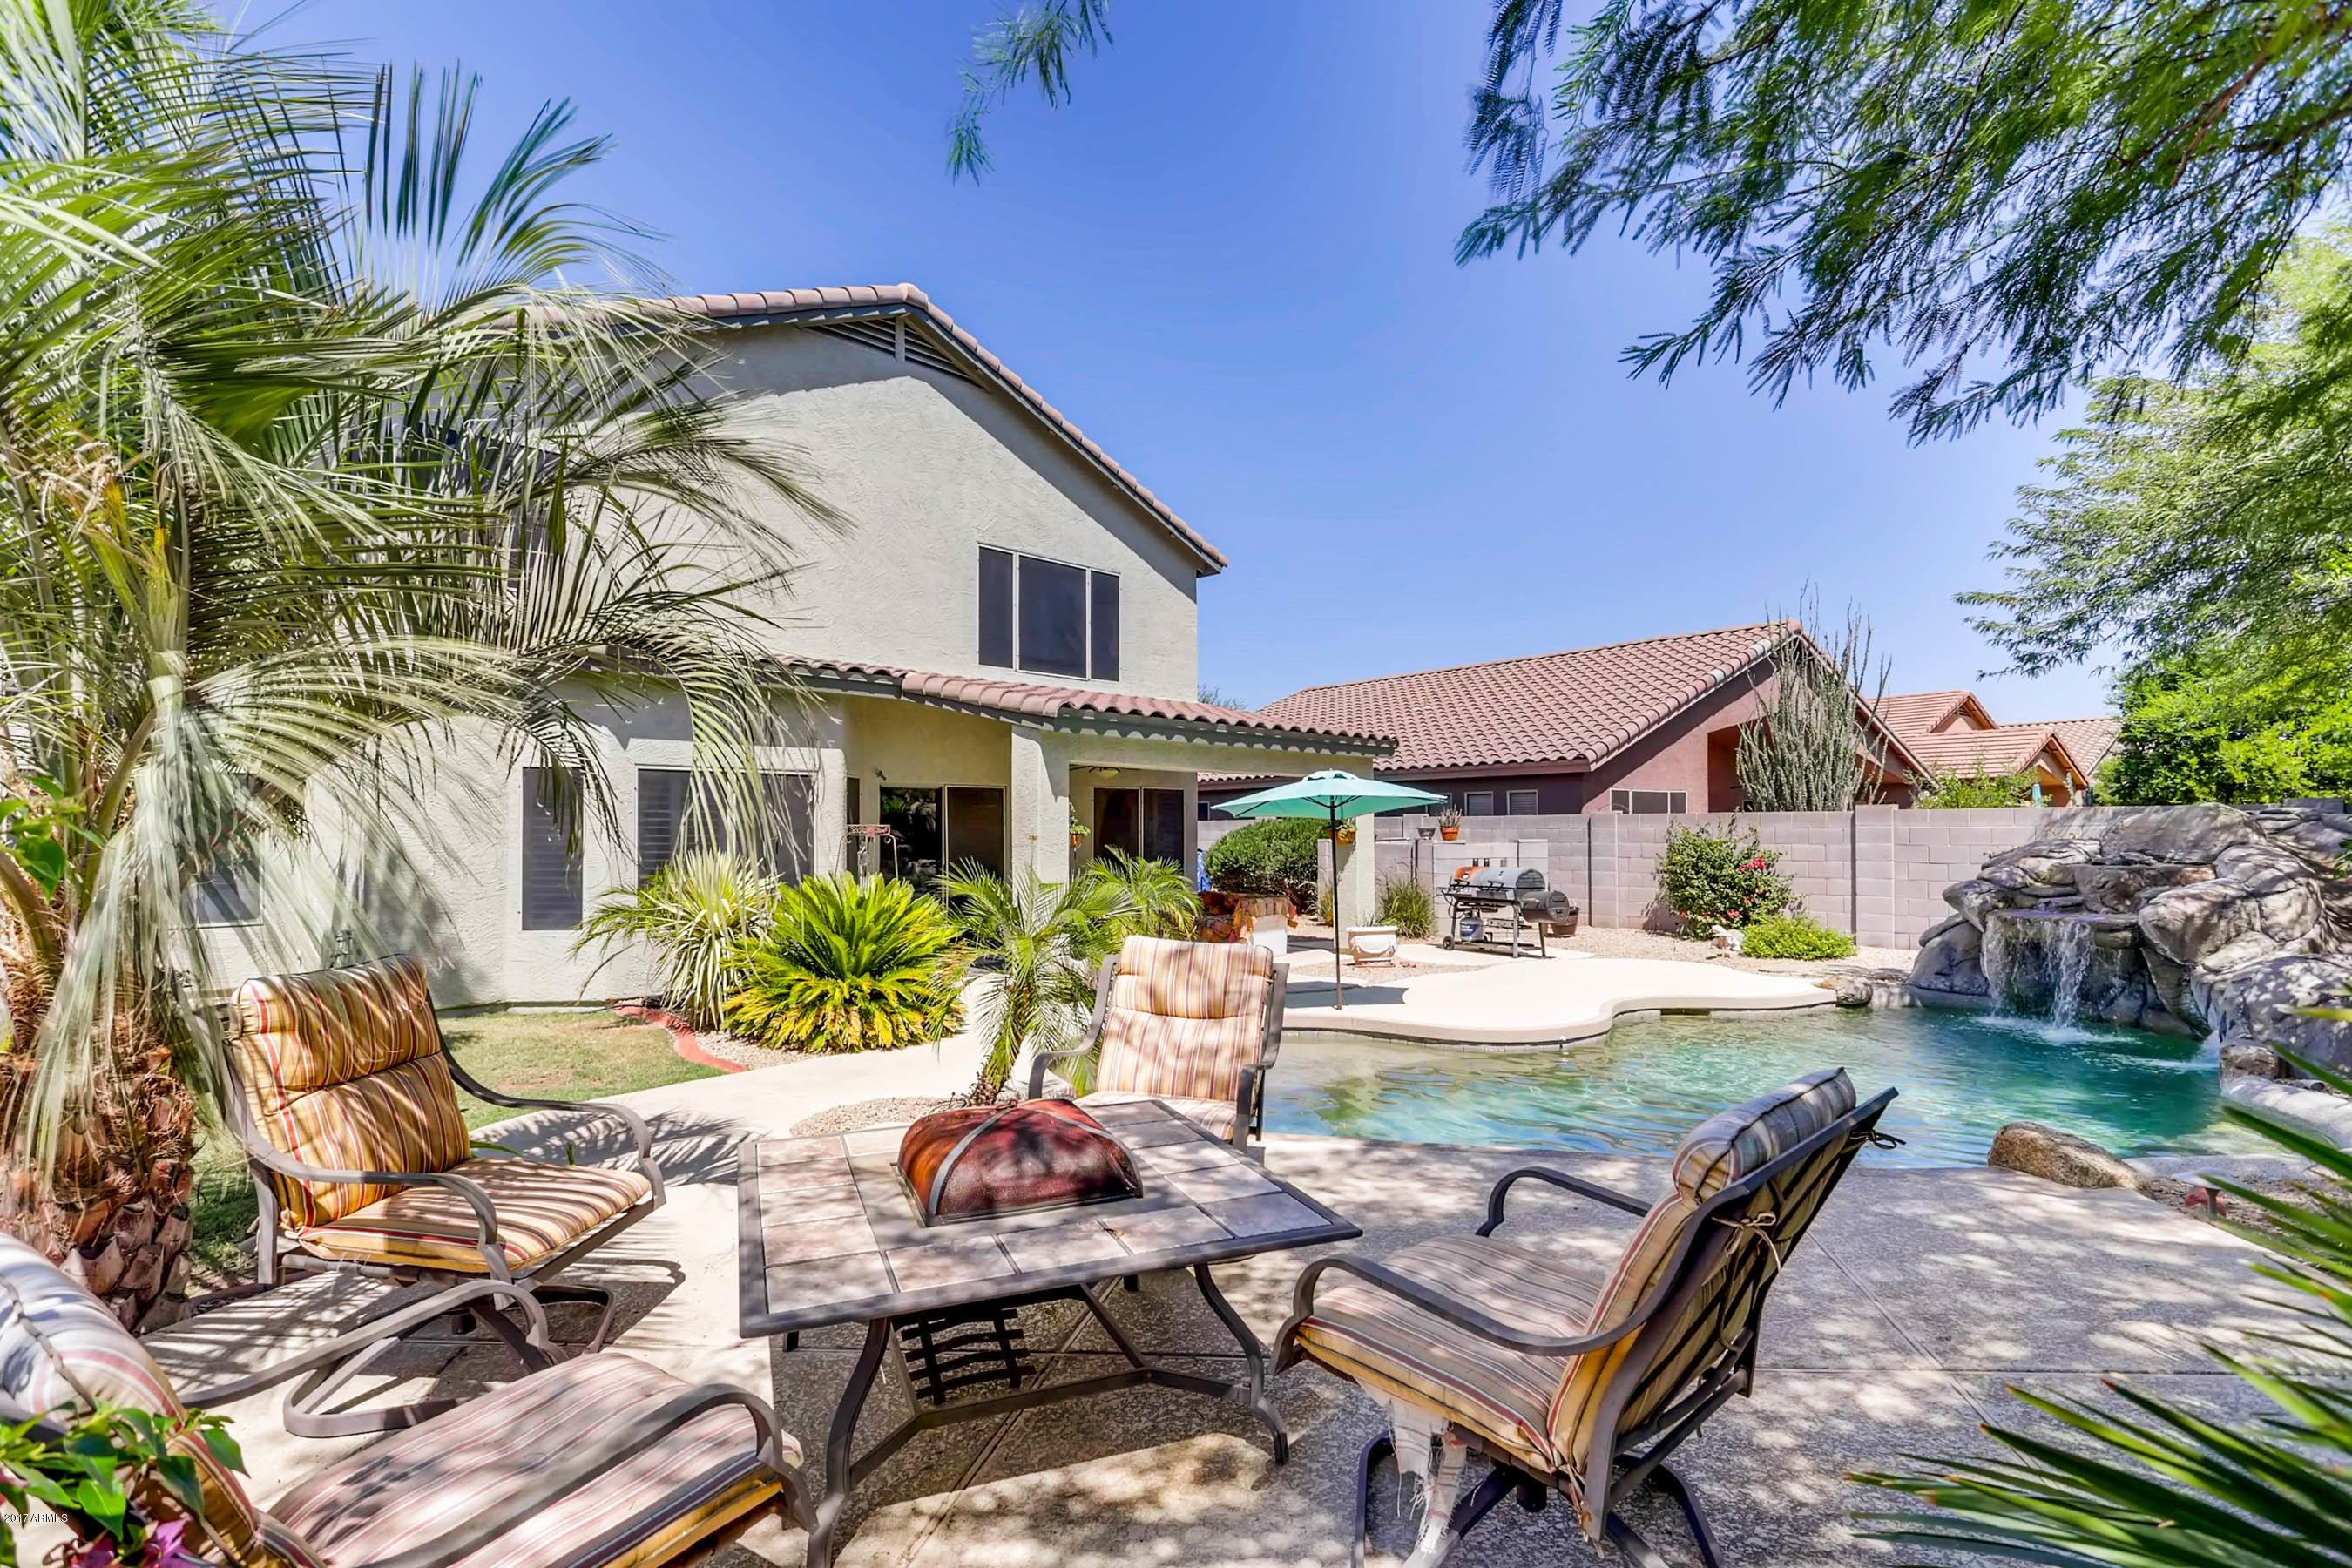 MLS 5659855 4419 E THORN TREE Drive, Cave Creek, AZ 85331 Cave Creek AZ Dove Valley Ranch